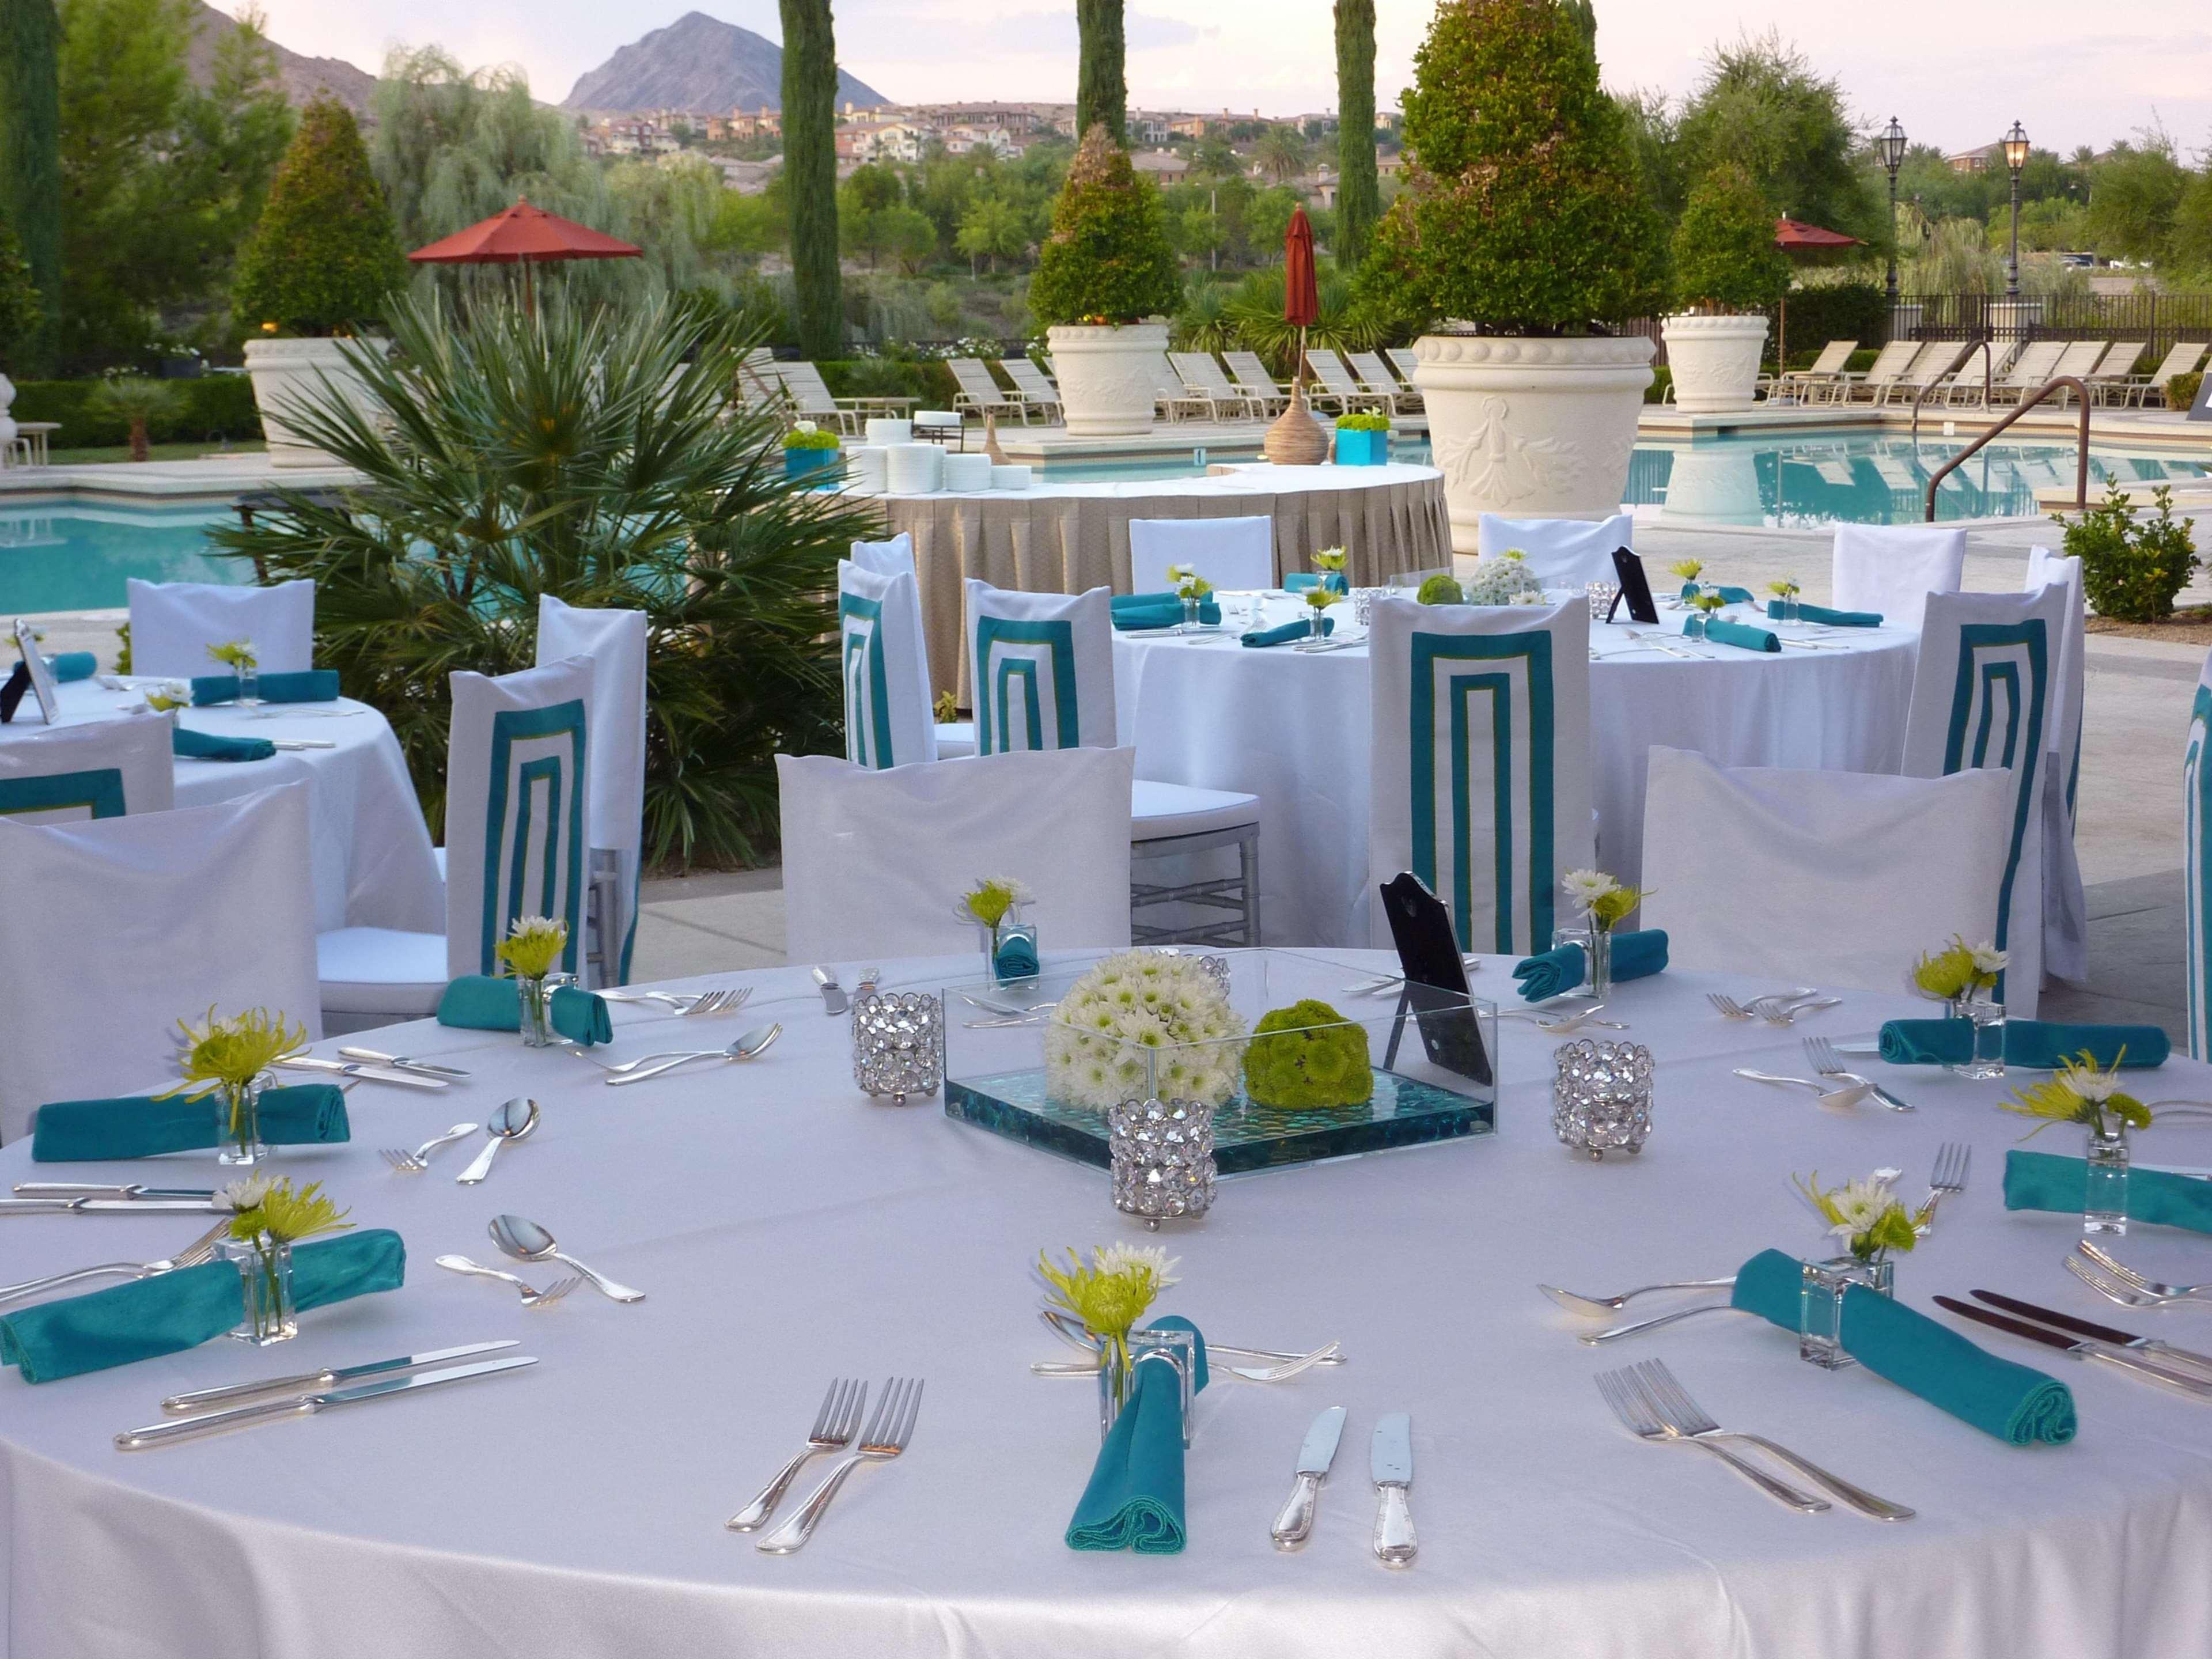 Hilton Lake Las Vegas Resort & Spa image 7